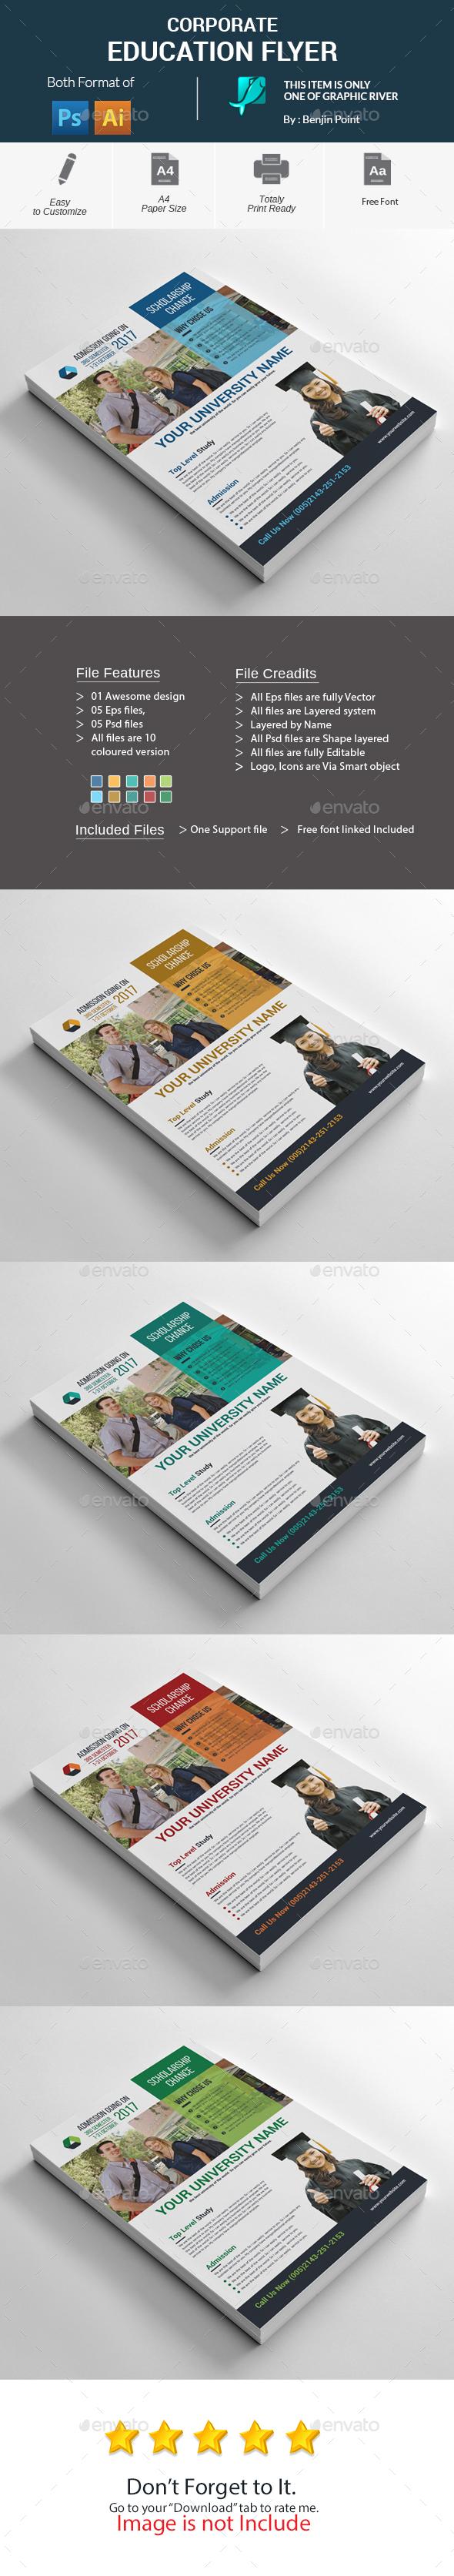 GraphicRiver Corporate Education Flyer 20308479